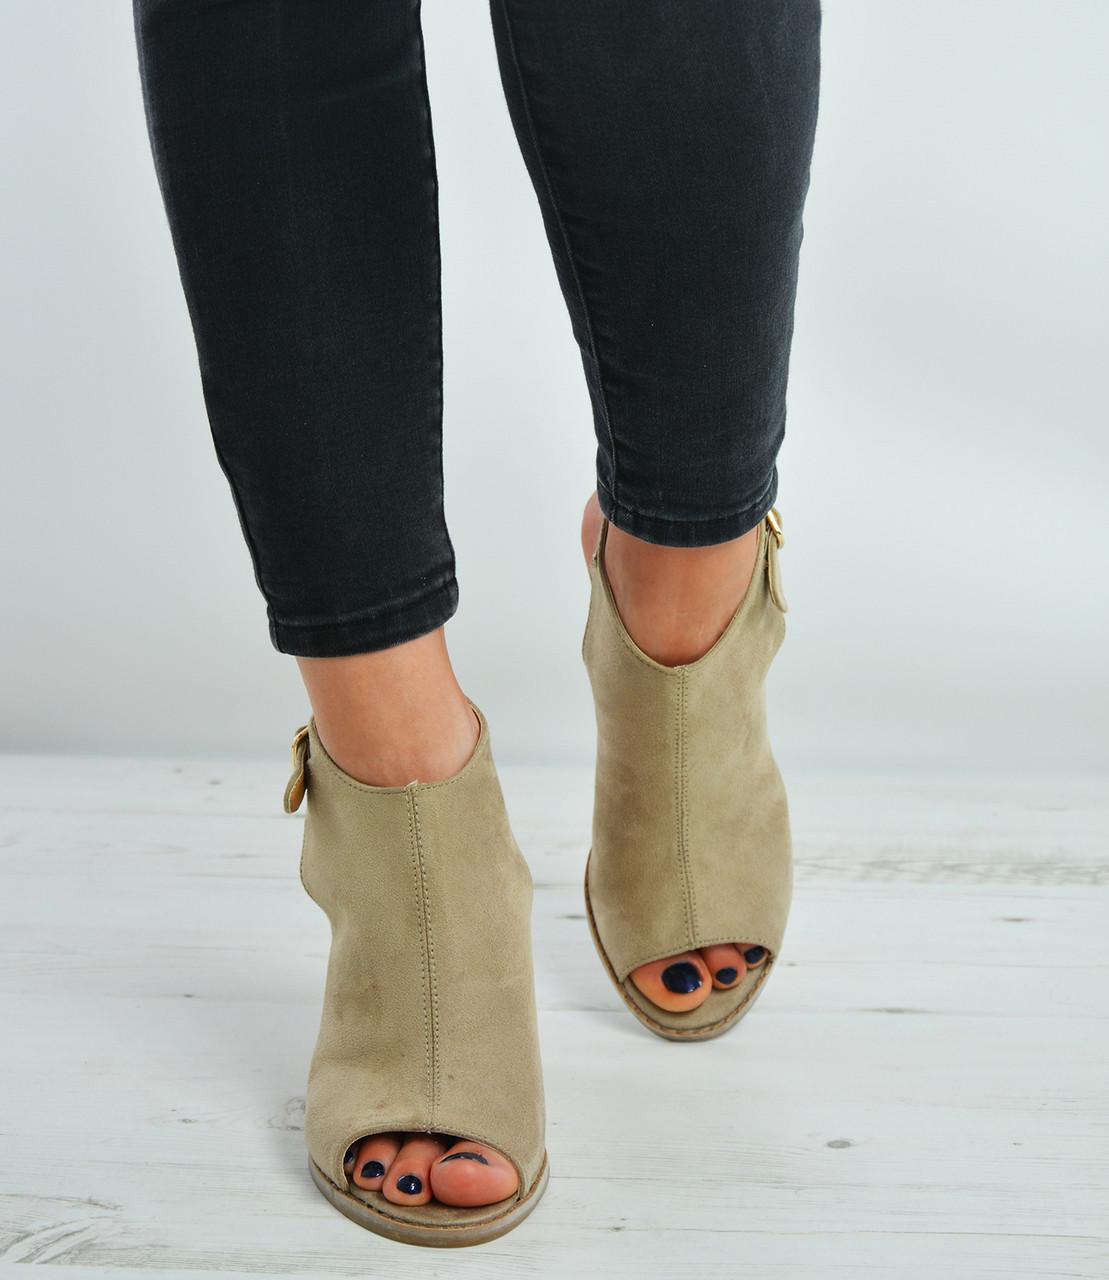 Beige Wedge Sandals Strap Ankle Suede 7yfgY6b